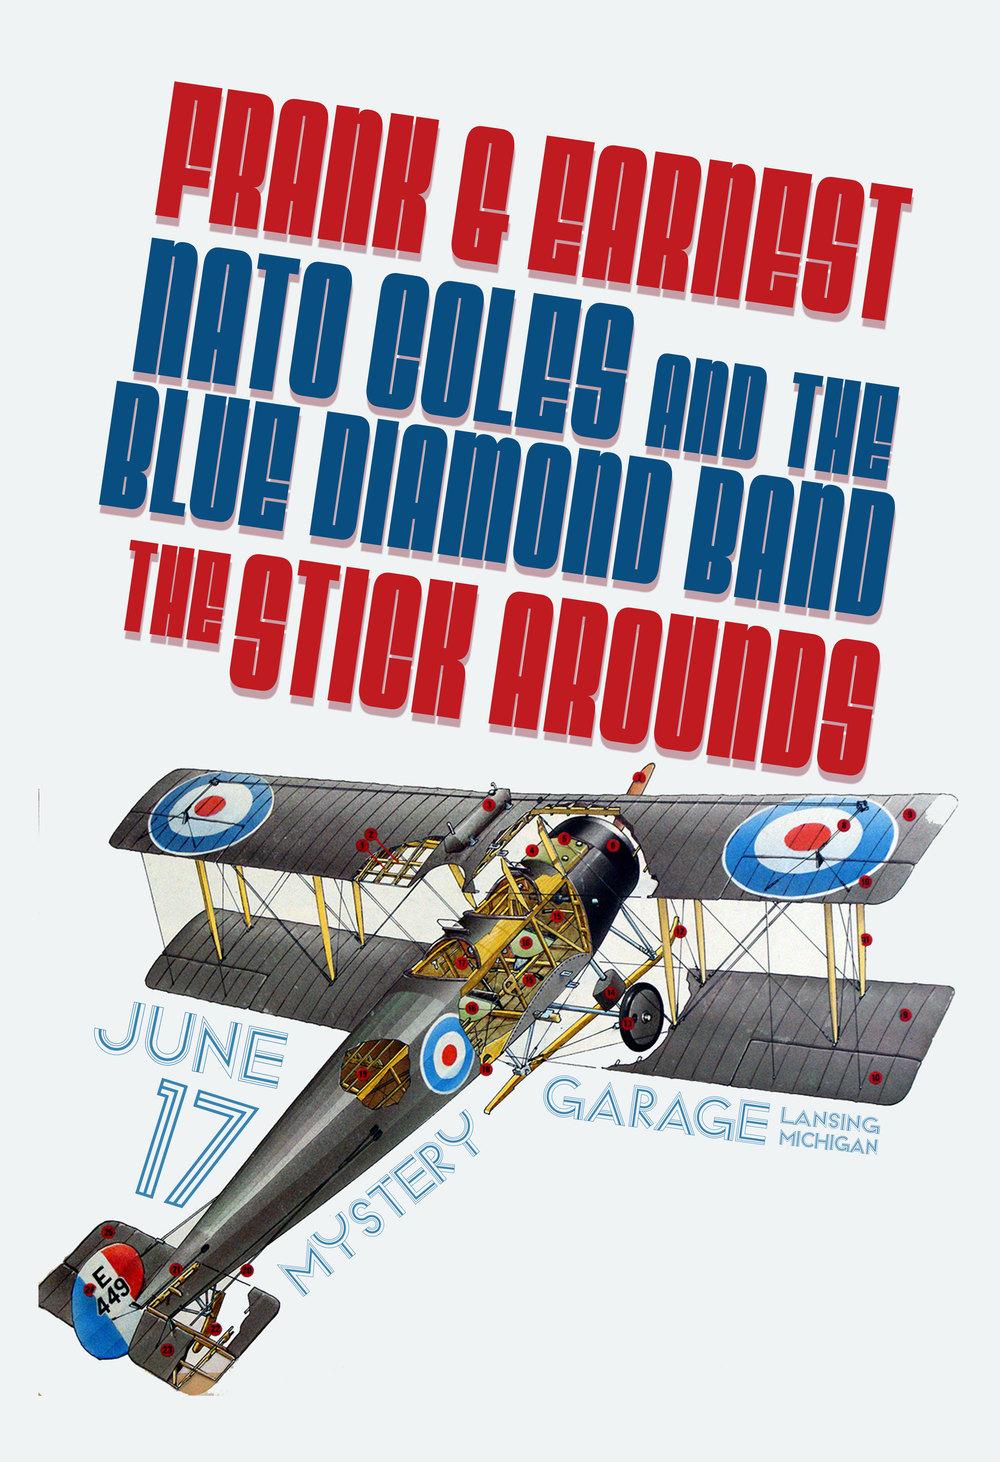 Mystery-Garage-June-17-Poster(web).jpg